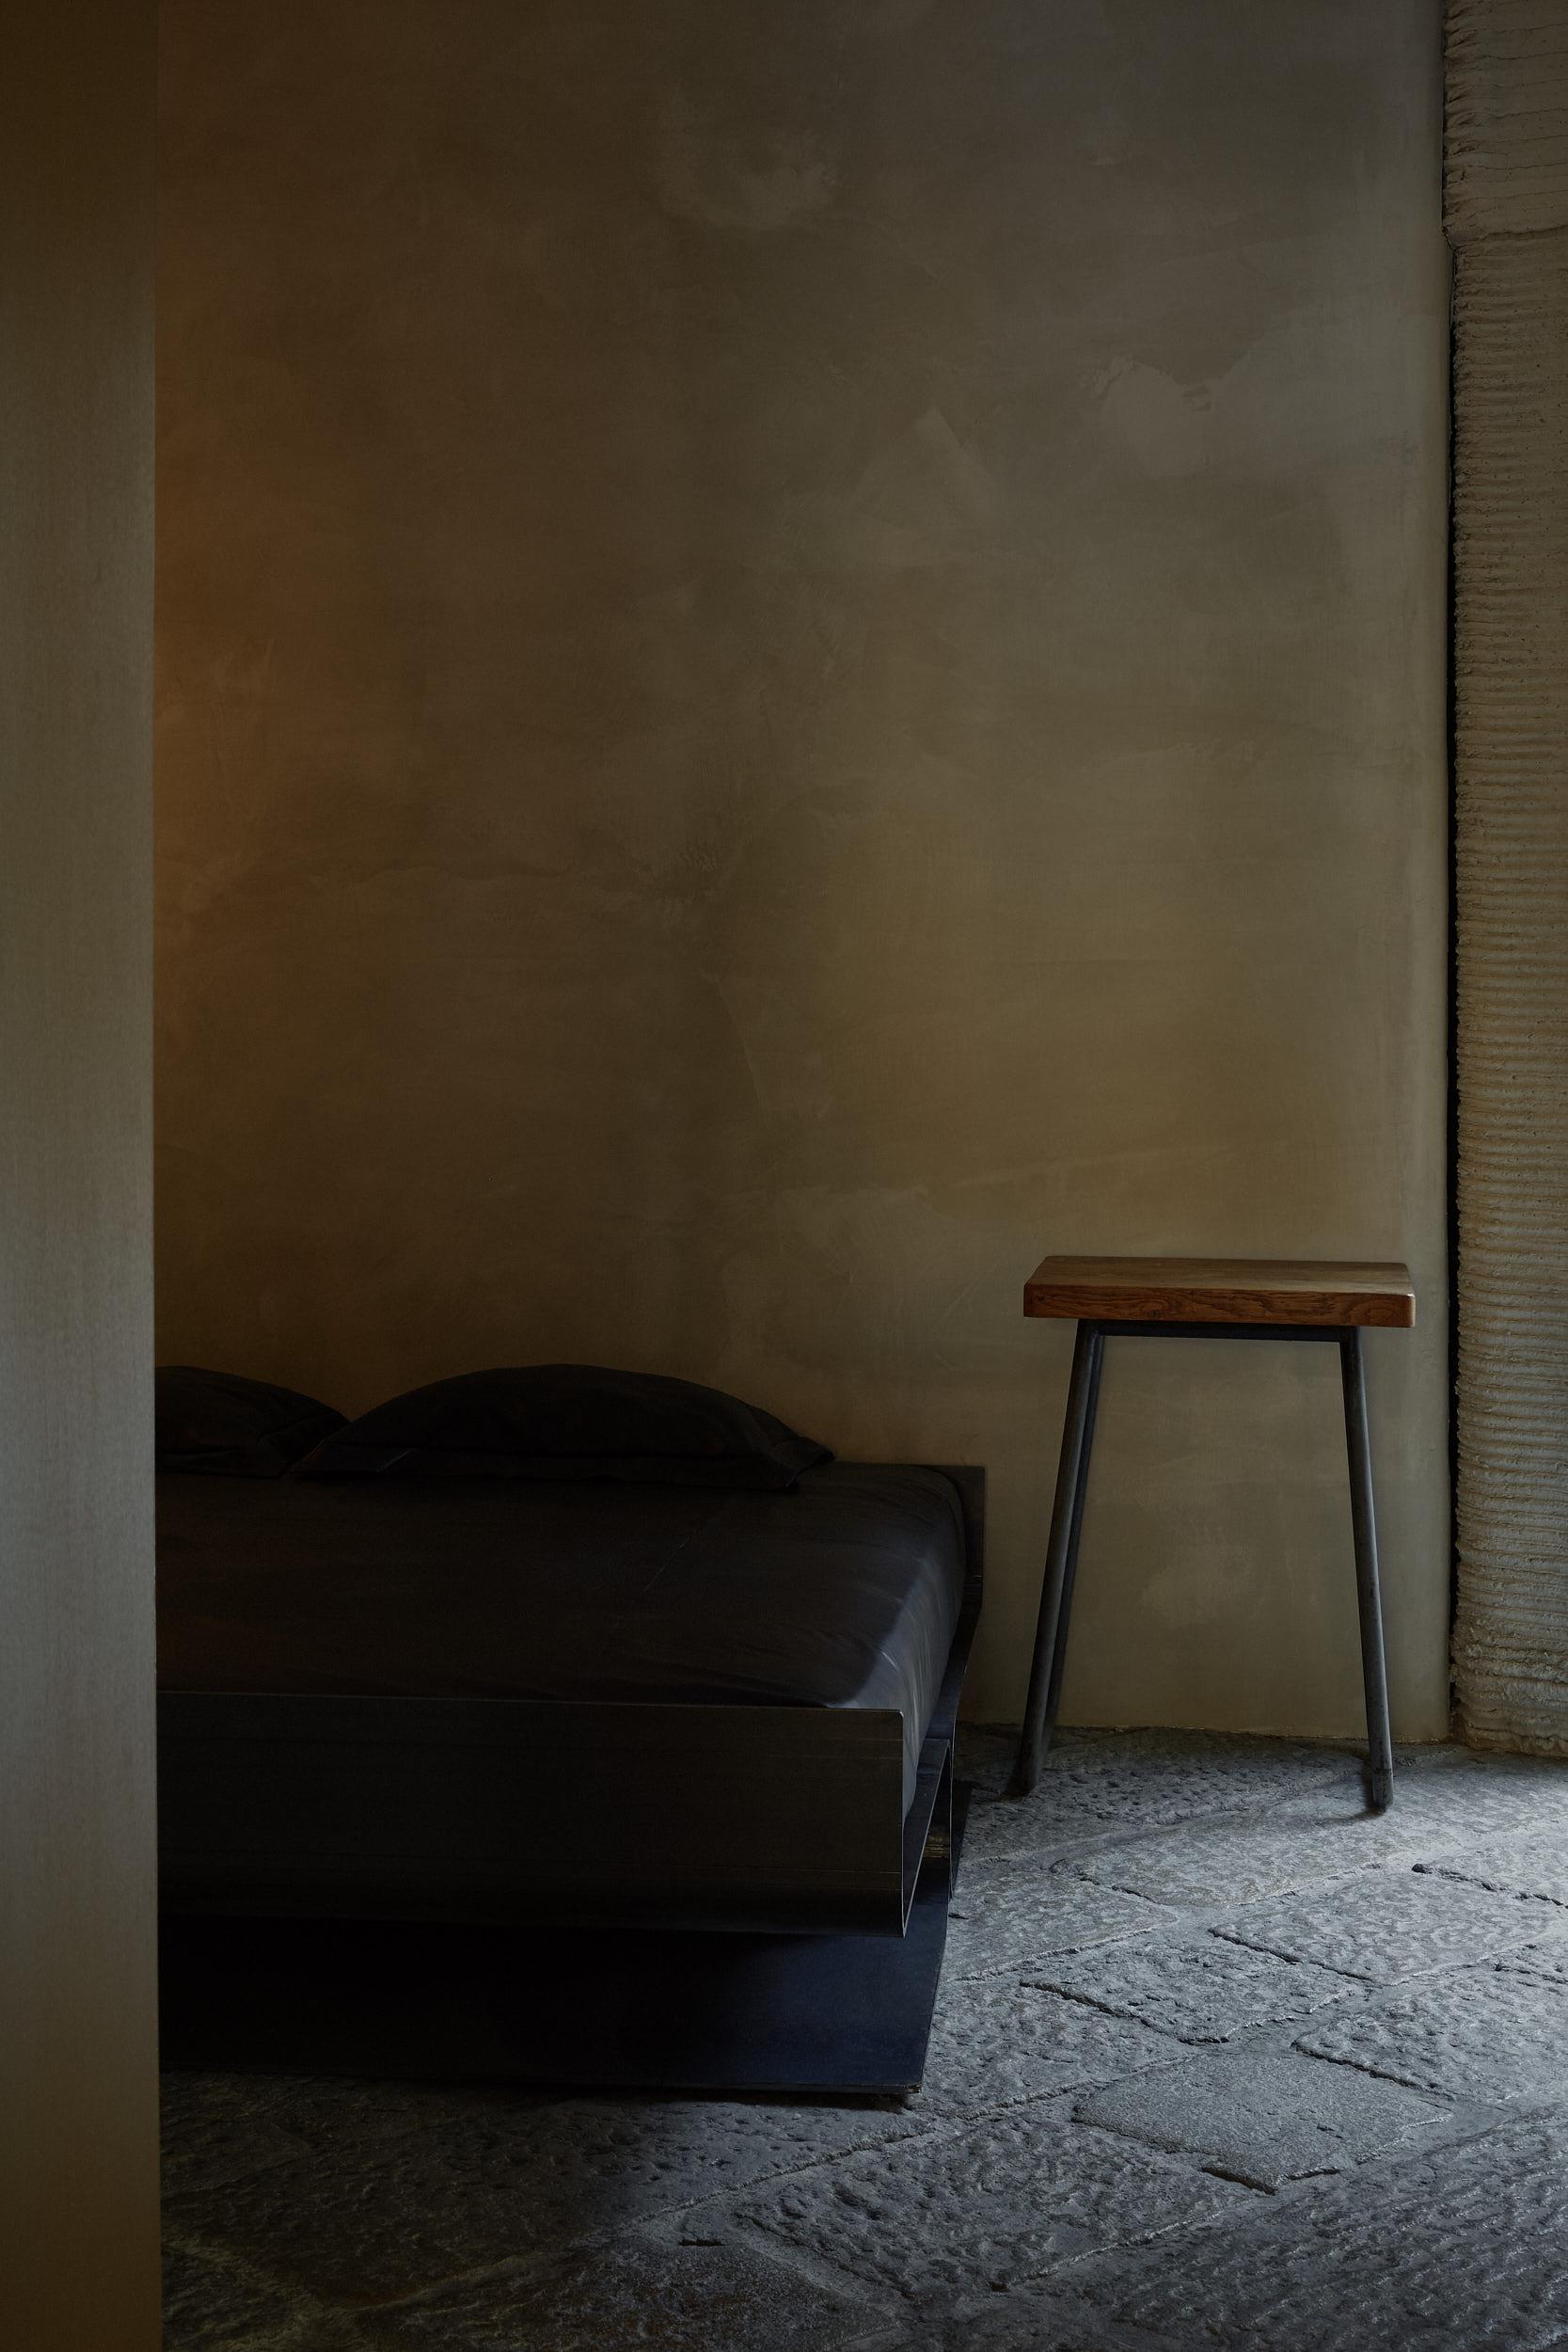 3D Housing 05 by CLS Architetti on Anniversary Magazine. Photo by Alex Lesage — threefold 5.jpg